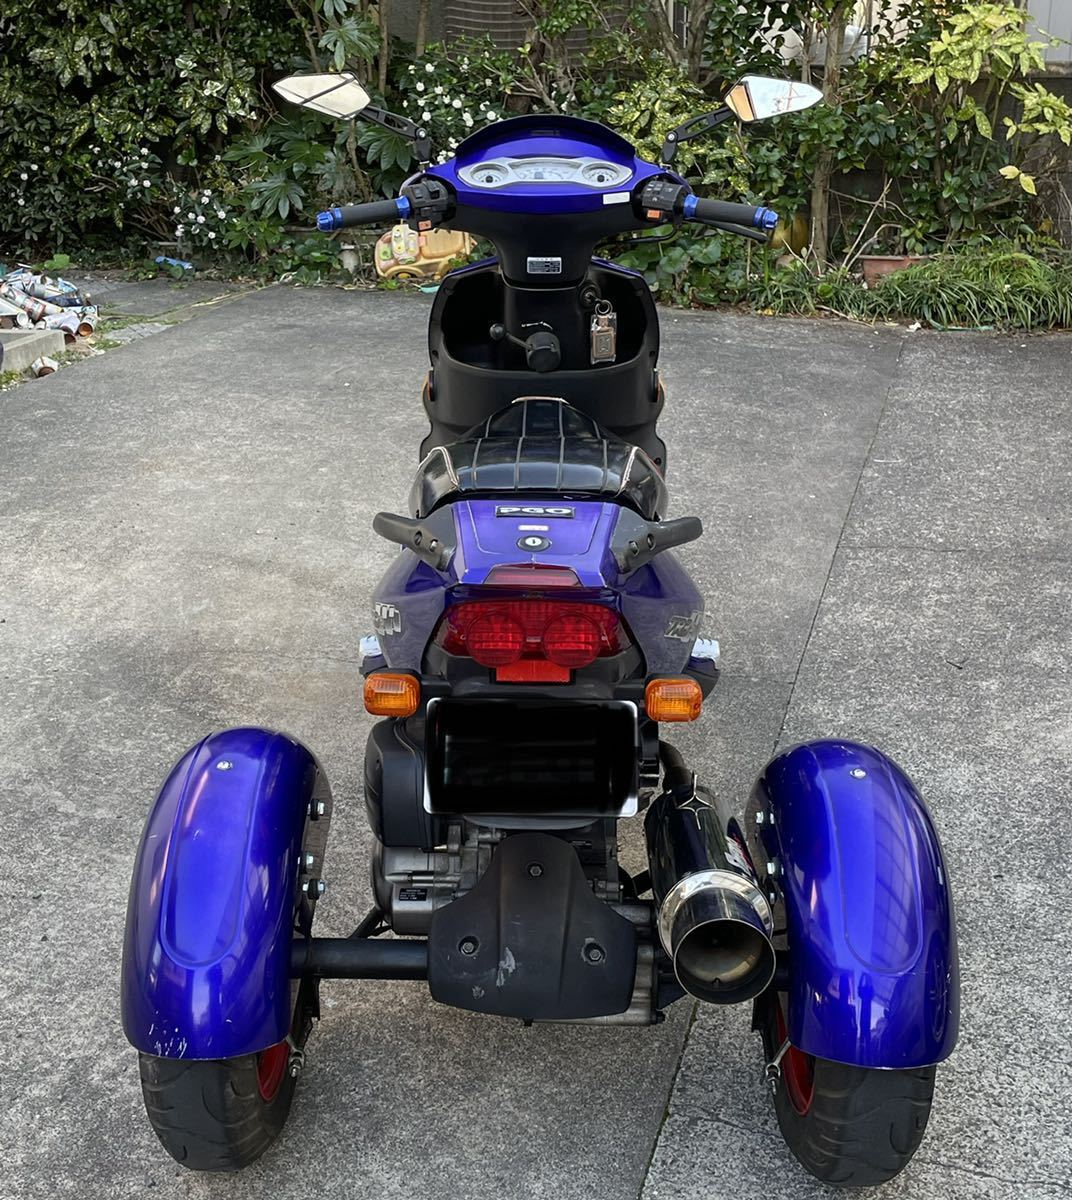 「PGO TR-3 トライク 150cc メーカー純正トライク 台湾製 カスタム済み 実動車」の画像3